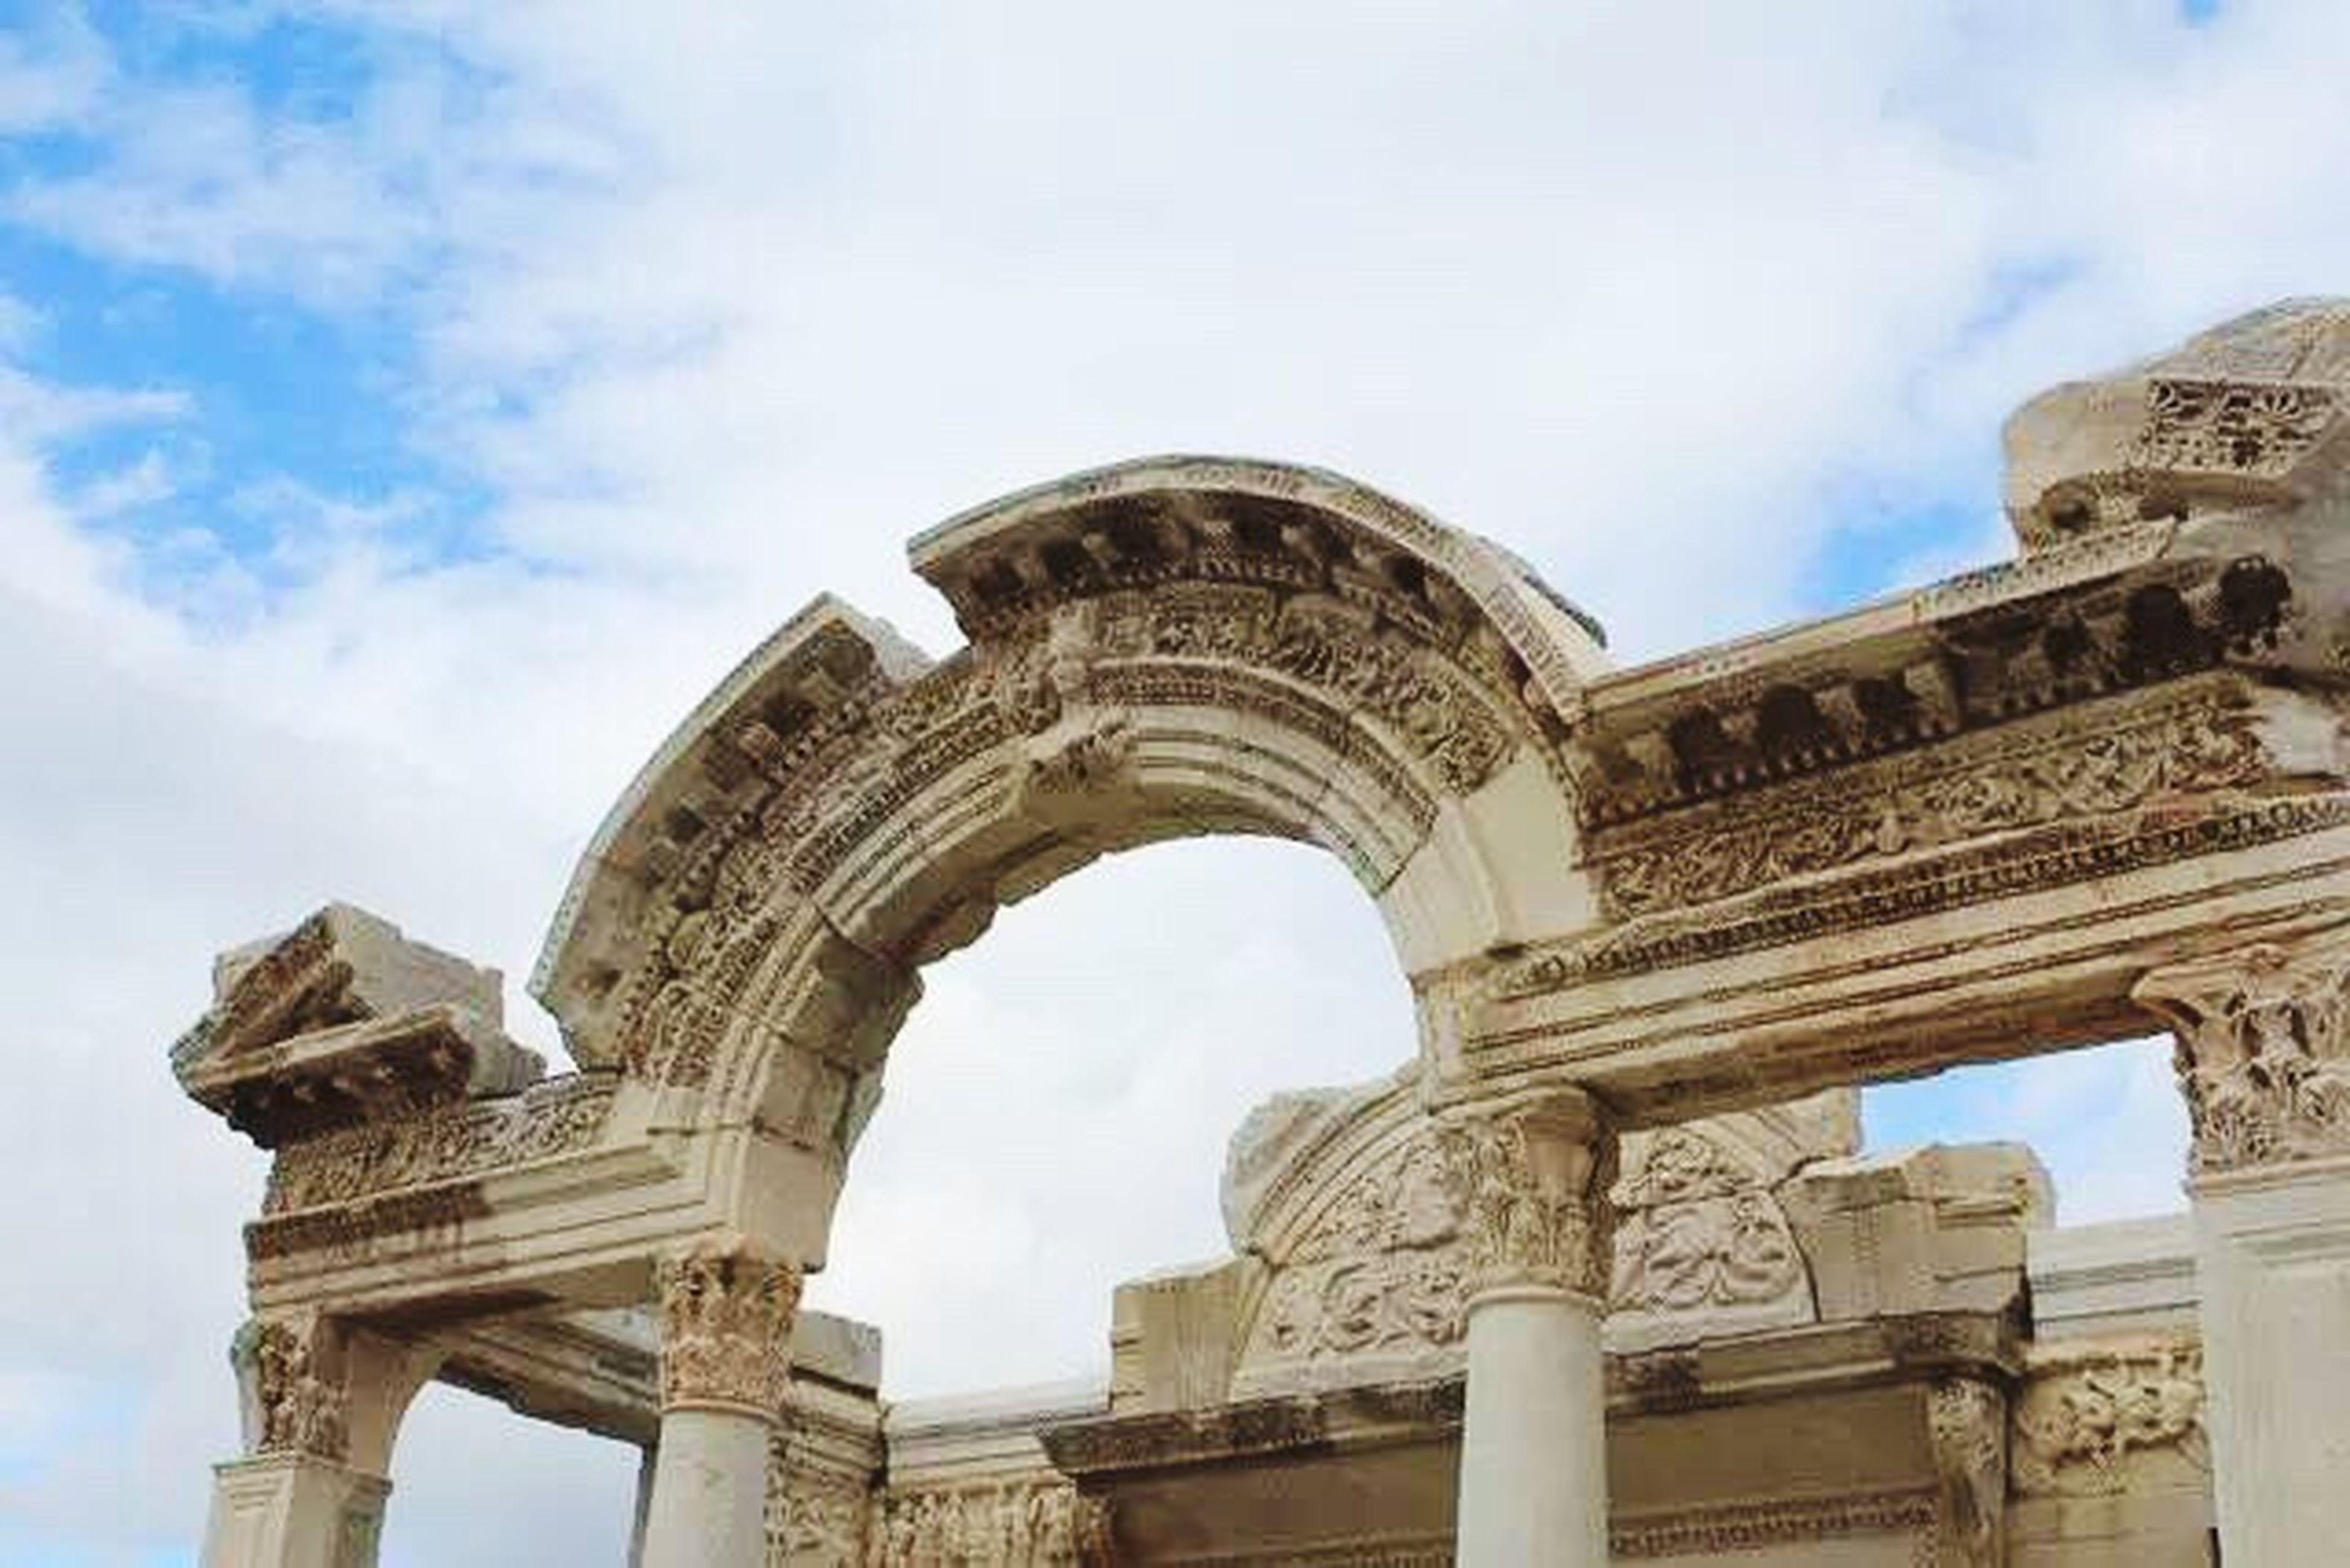 architecture, sky, arch, cloud - sky, travel destinations, city, outdoors, building exterior, built structure, history, triumphal arch, low angle view, day, cultures, no people, ancient civilization